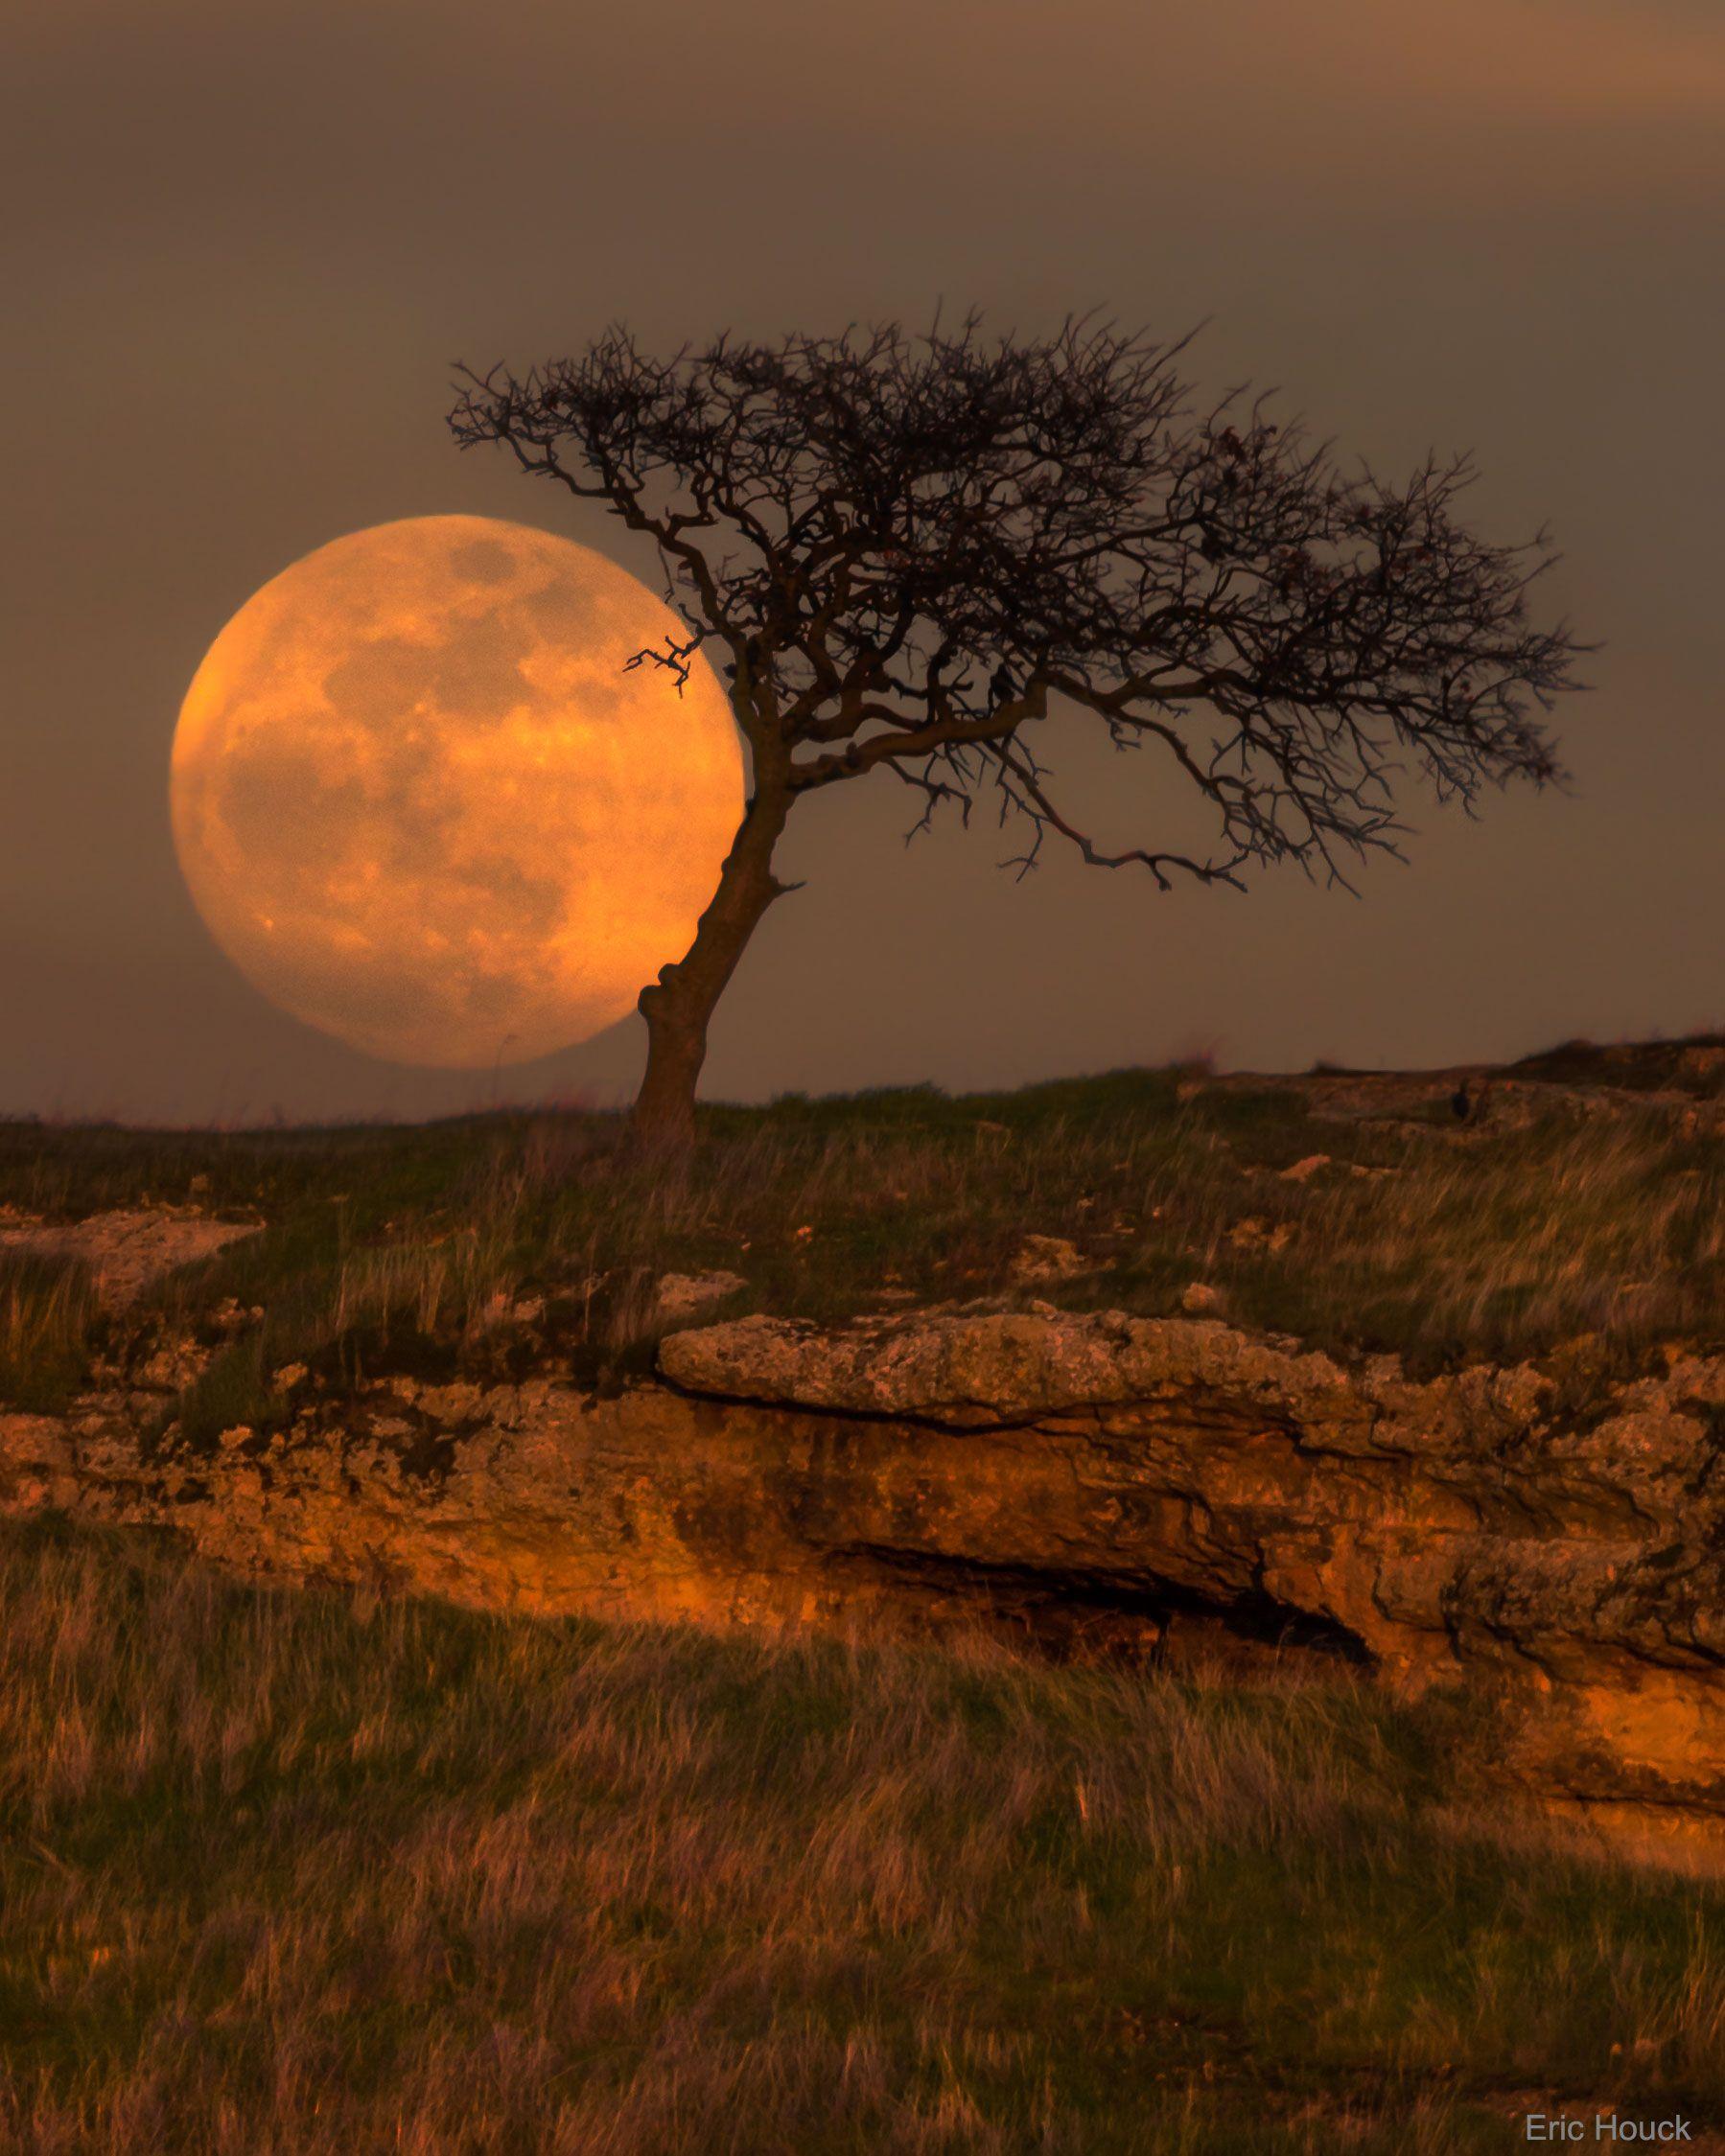 Blue Moon Tree. California, USA. Eric Houck | The Moon | Pinterest ...